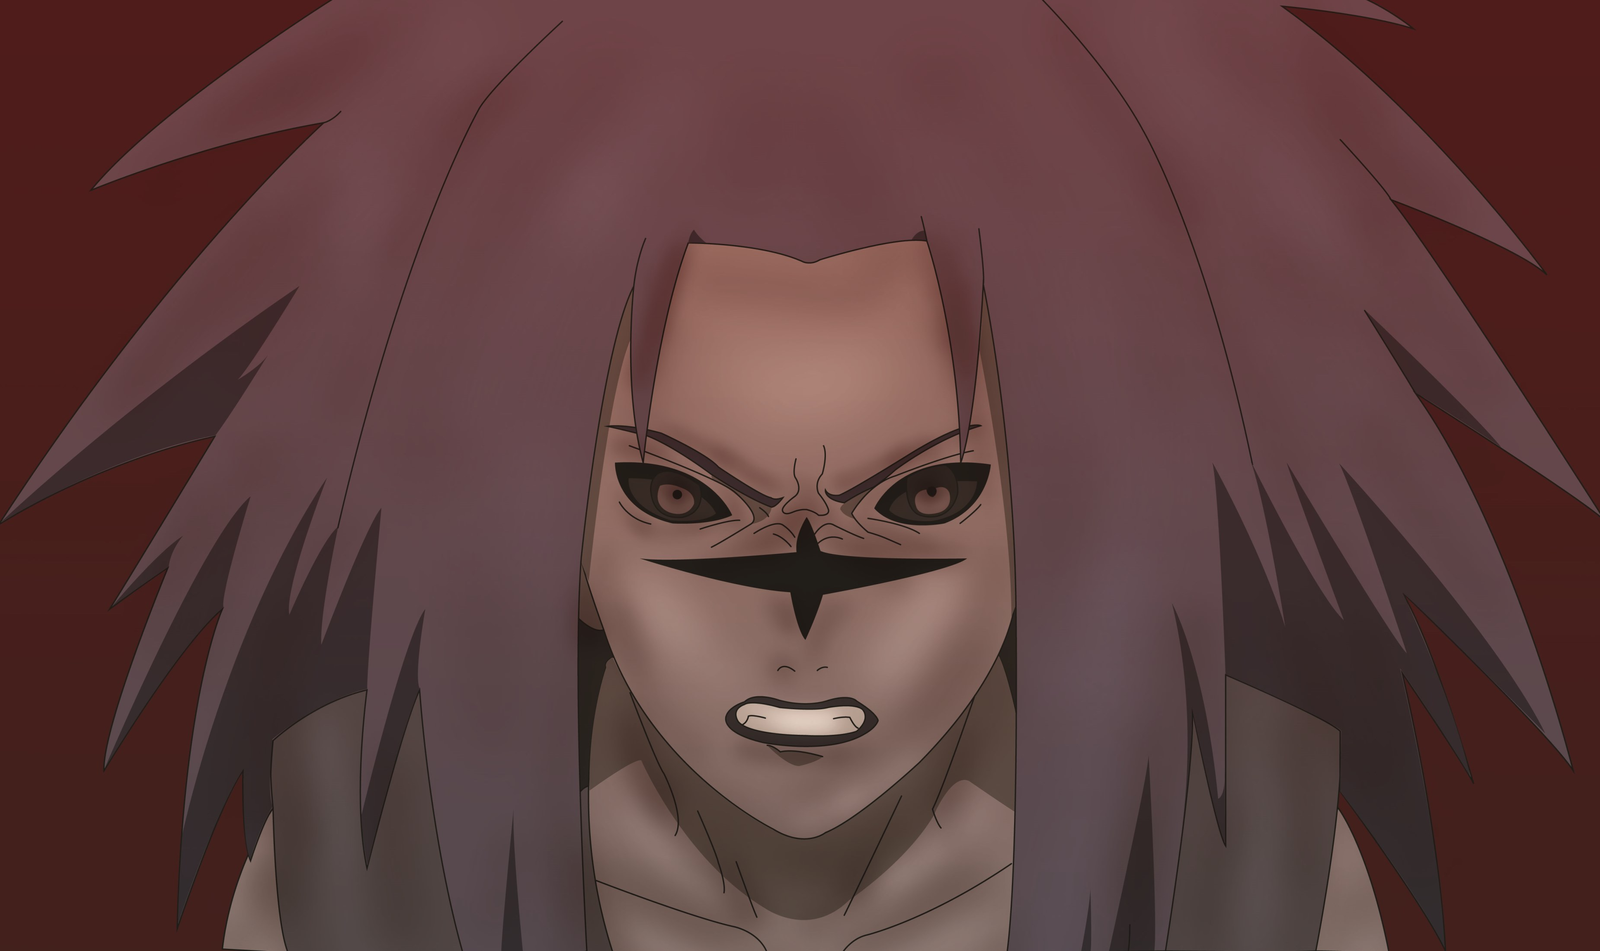 pin anime cursedmark sasuke naruto wallpaper desktop sasuke